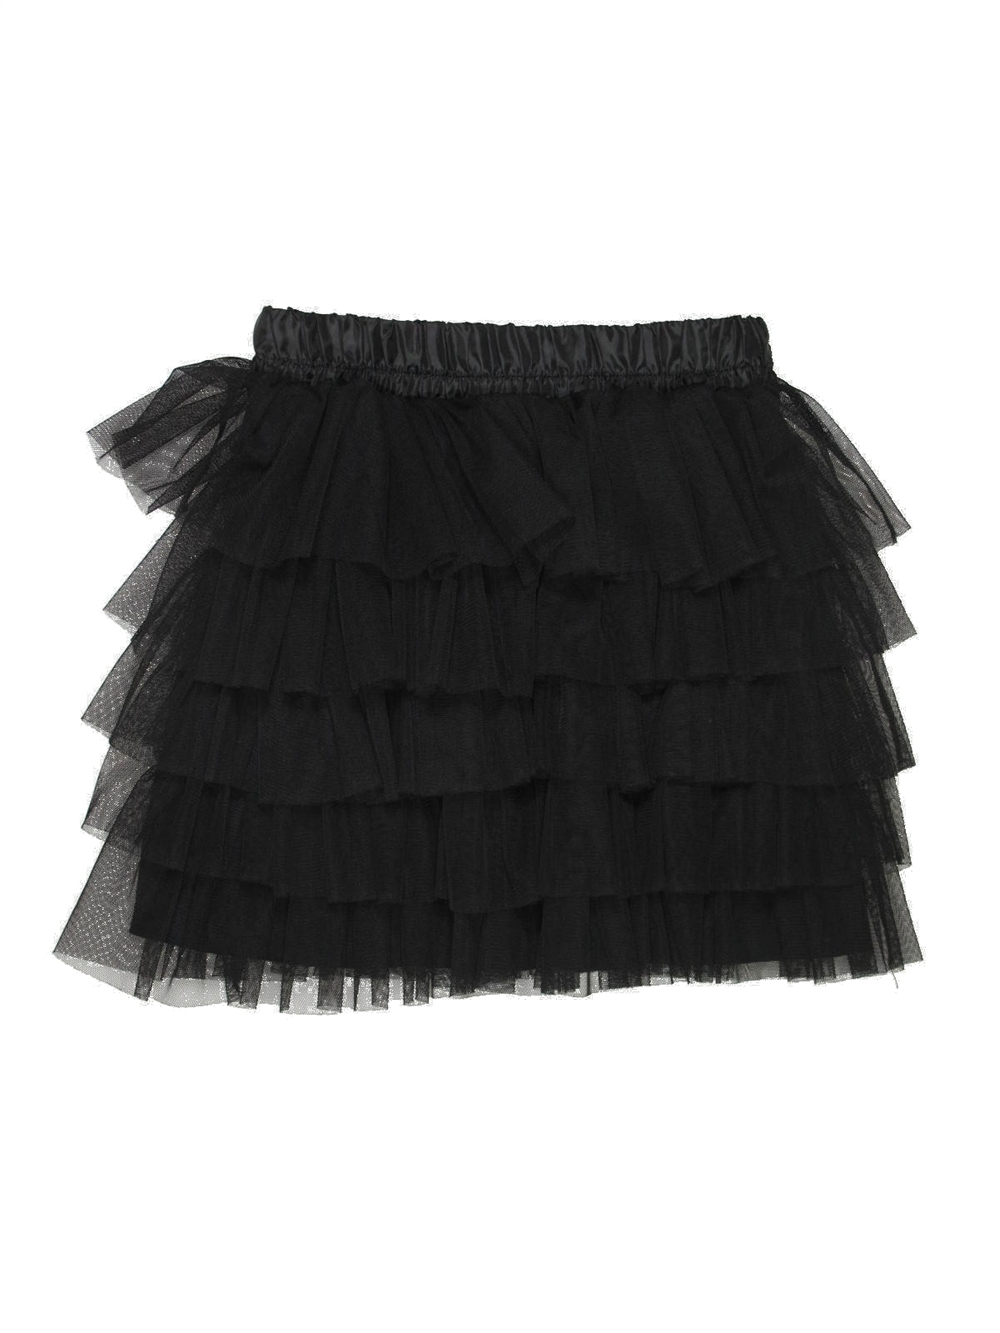 sale uk fashion style buy popular Jupe Fille ZARA 14 ans pas cher, 6.60 € - #457094